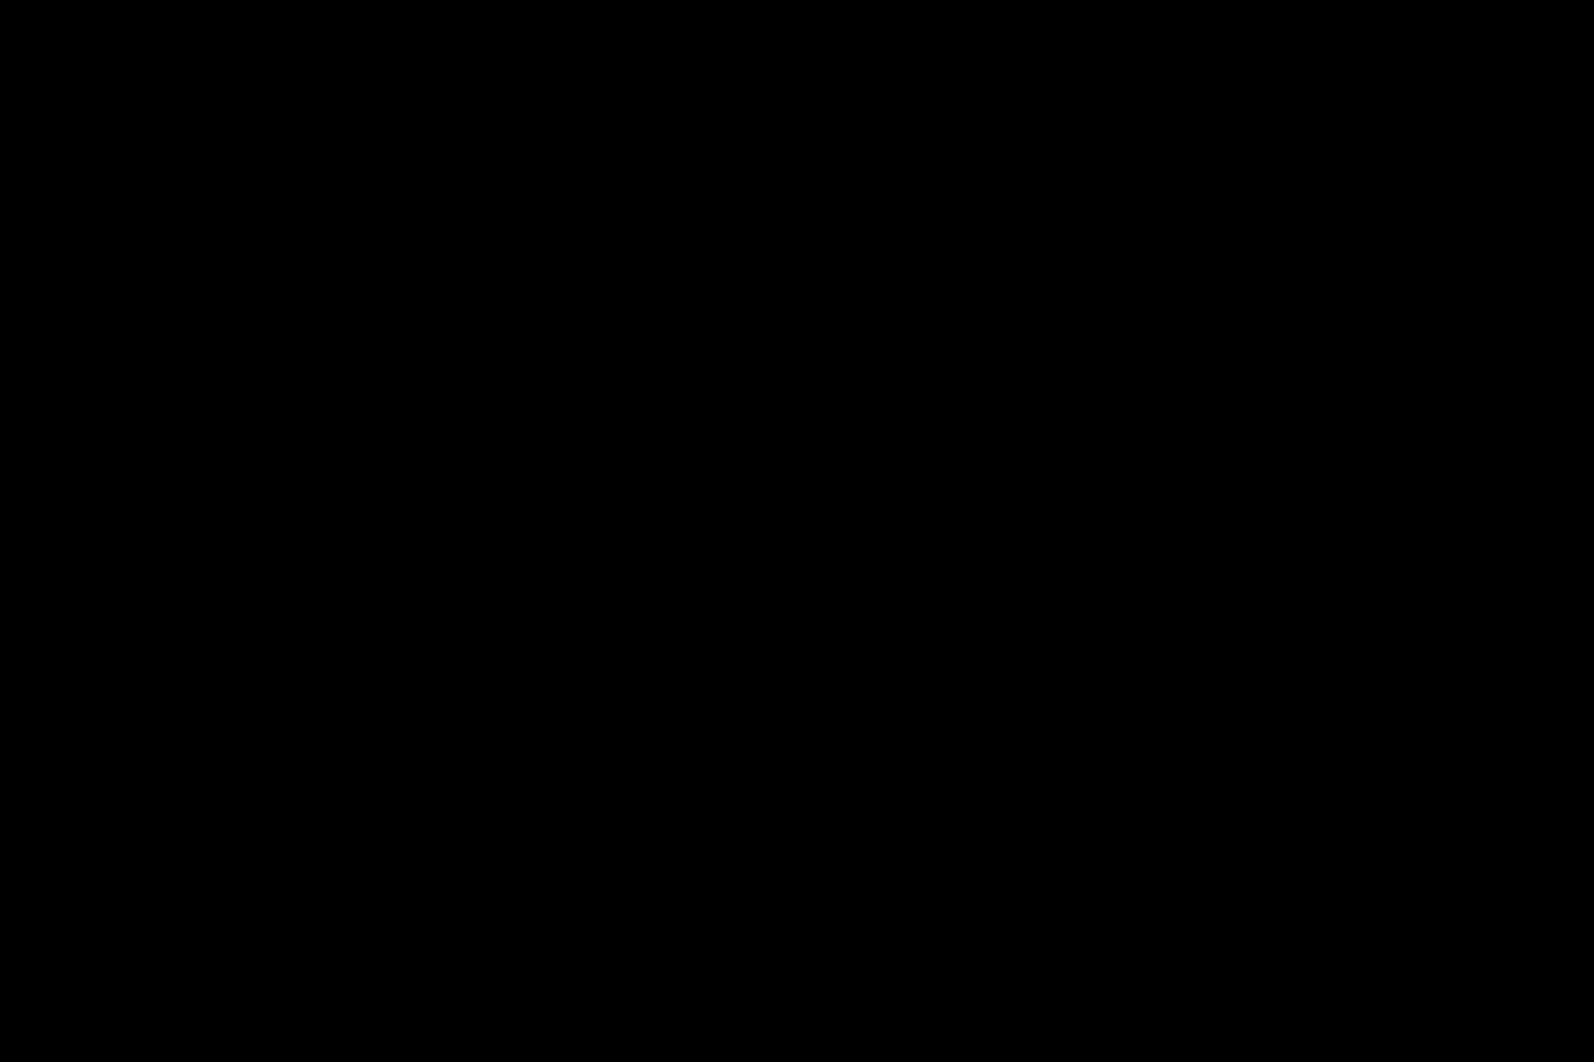 Outline : Scrolls Icon set - DESIGN 01 -